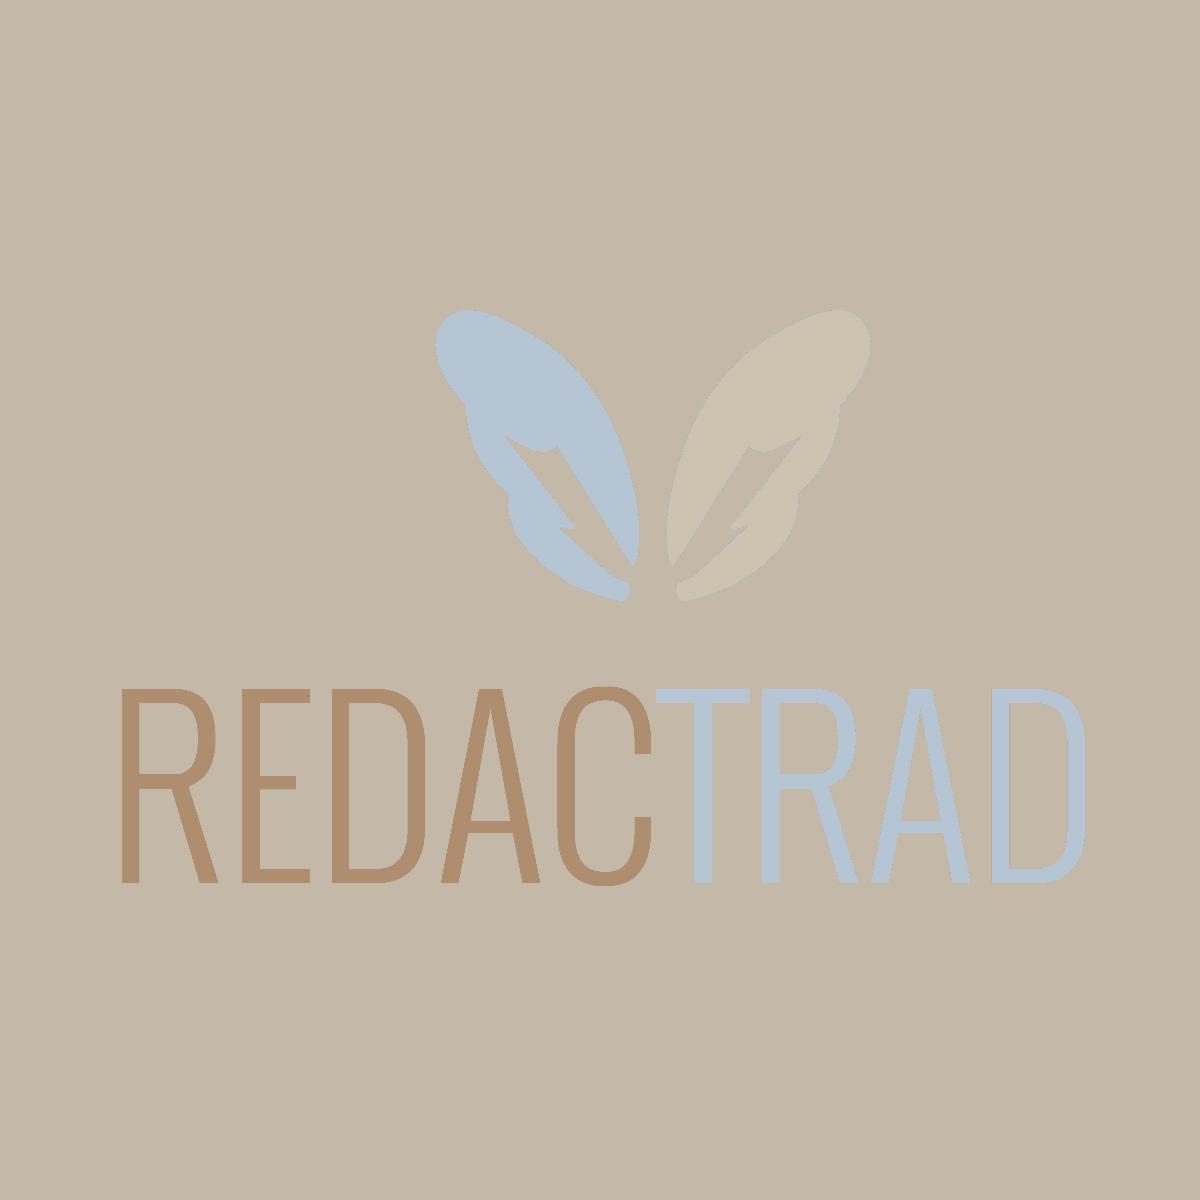 Logo Redactrad - Par Cyan Concept